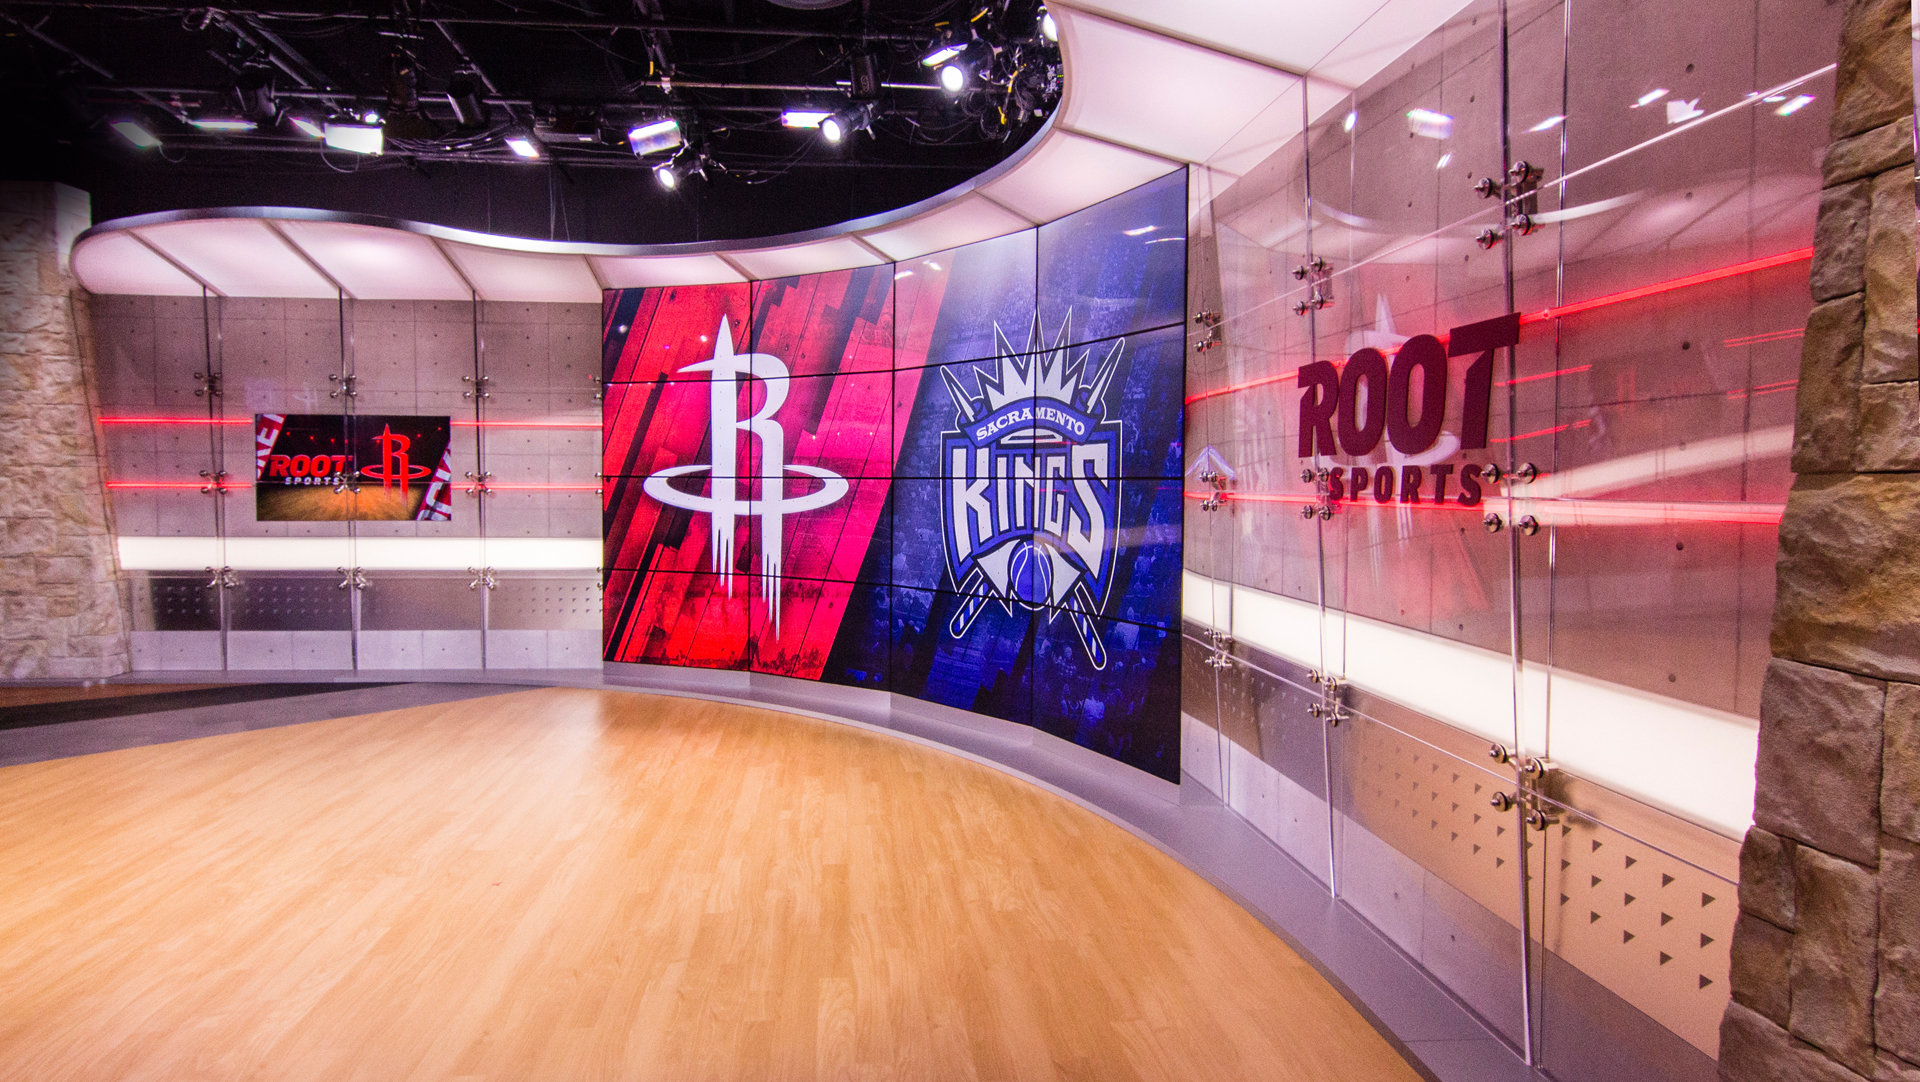 ncs_root-sports-southwest-houston-studio_003